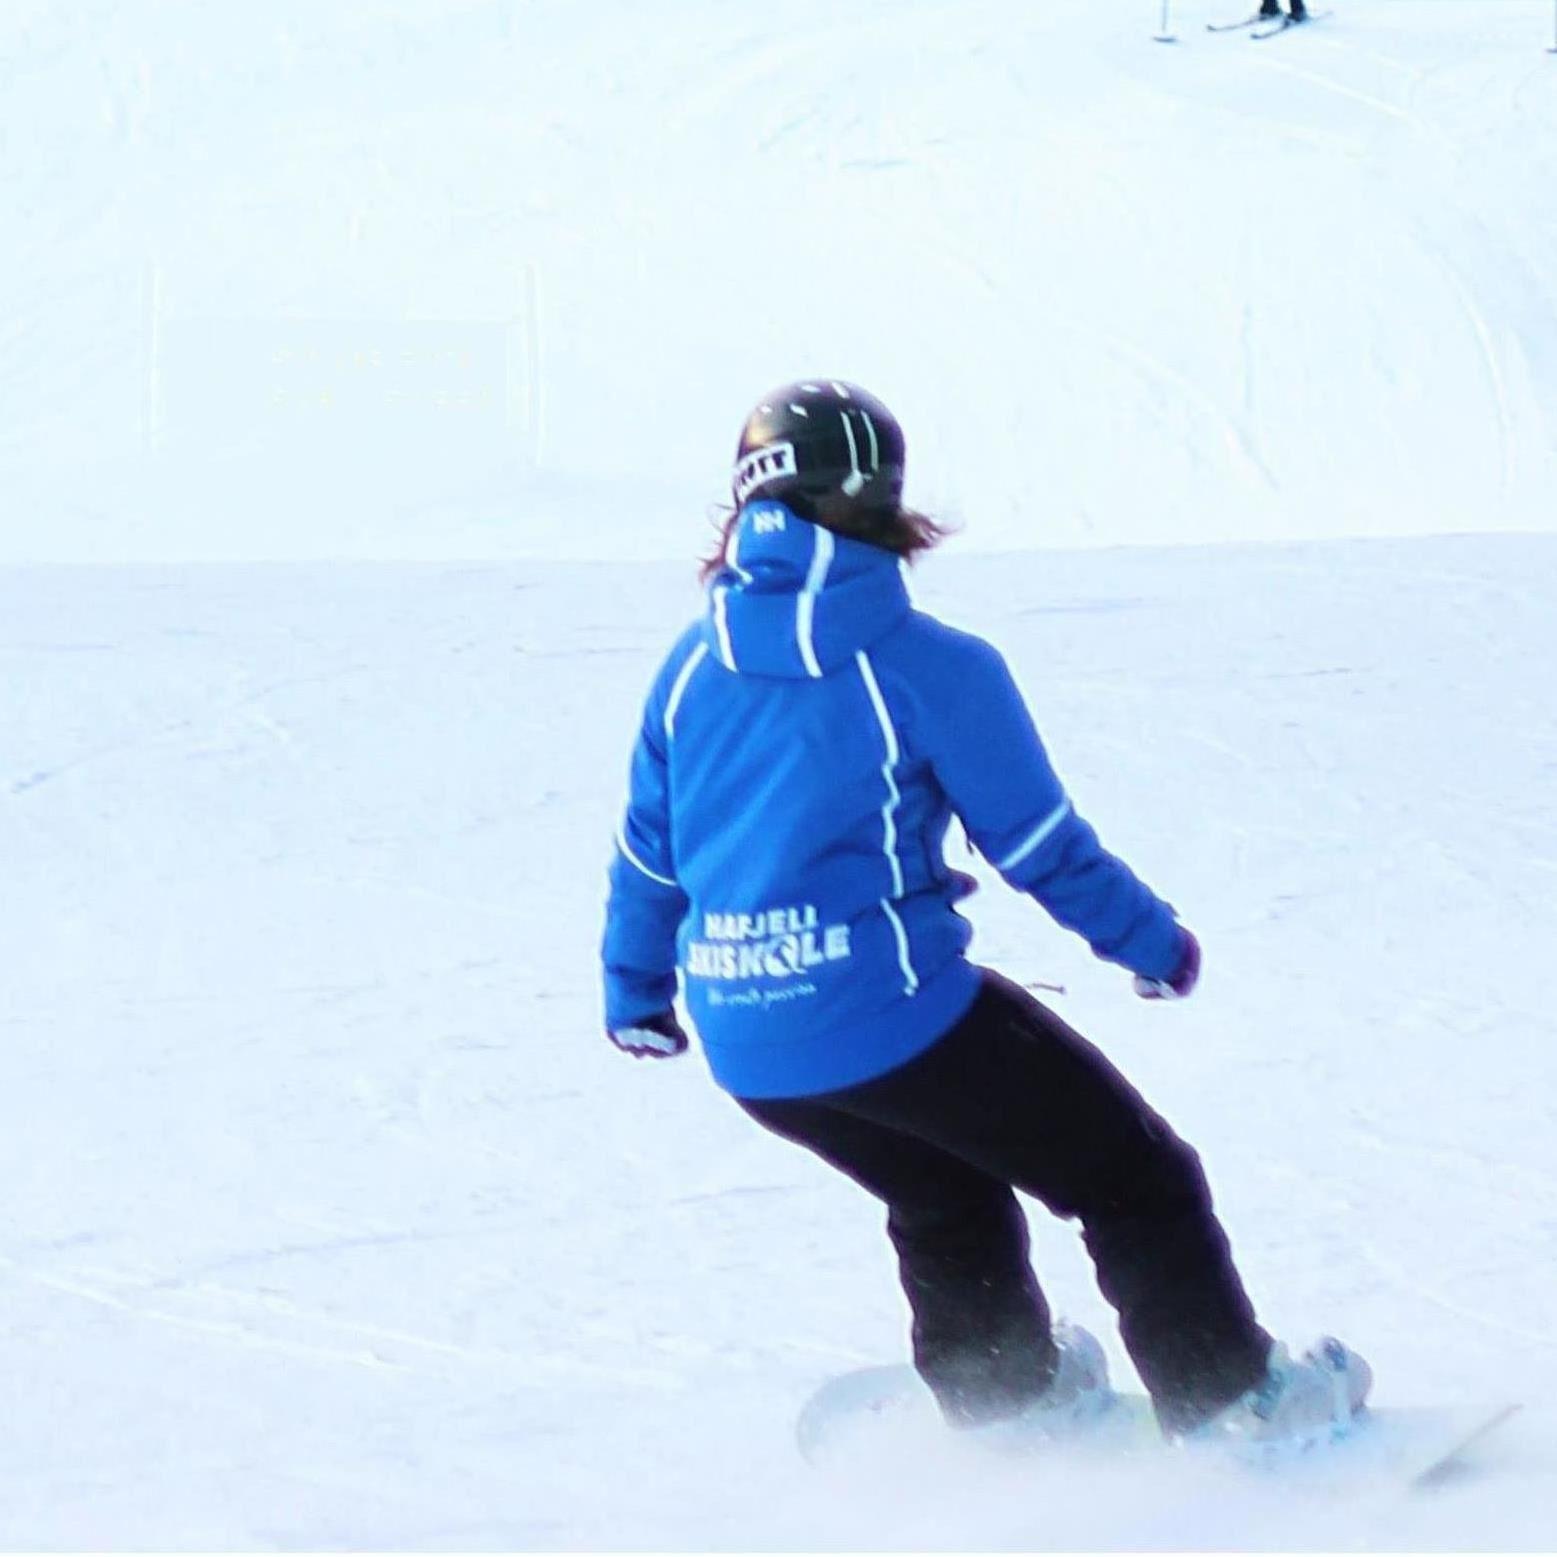 Grupper Snowboard Voksen 16+ år